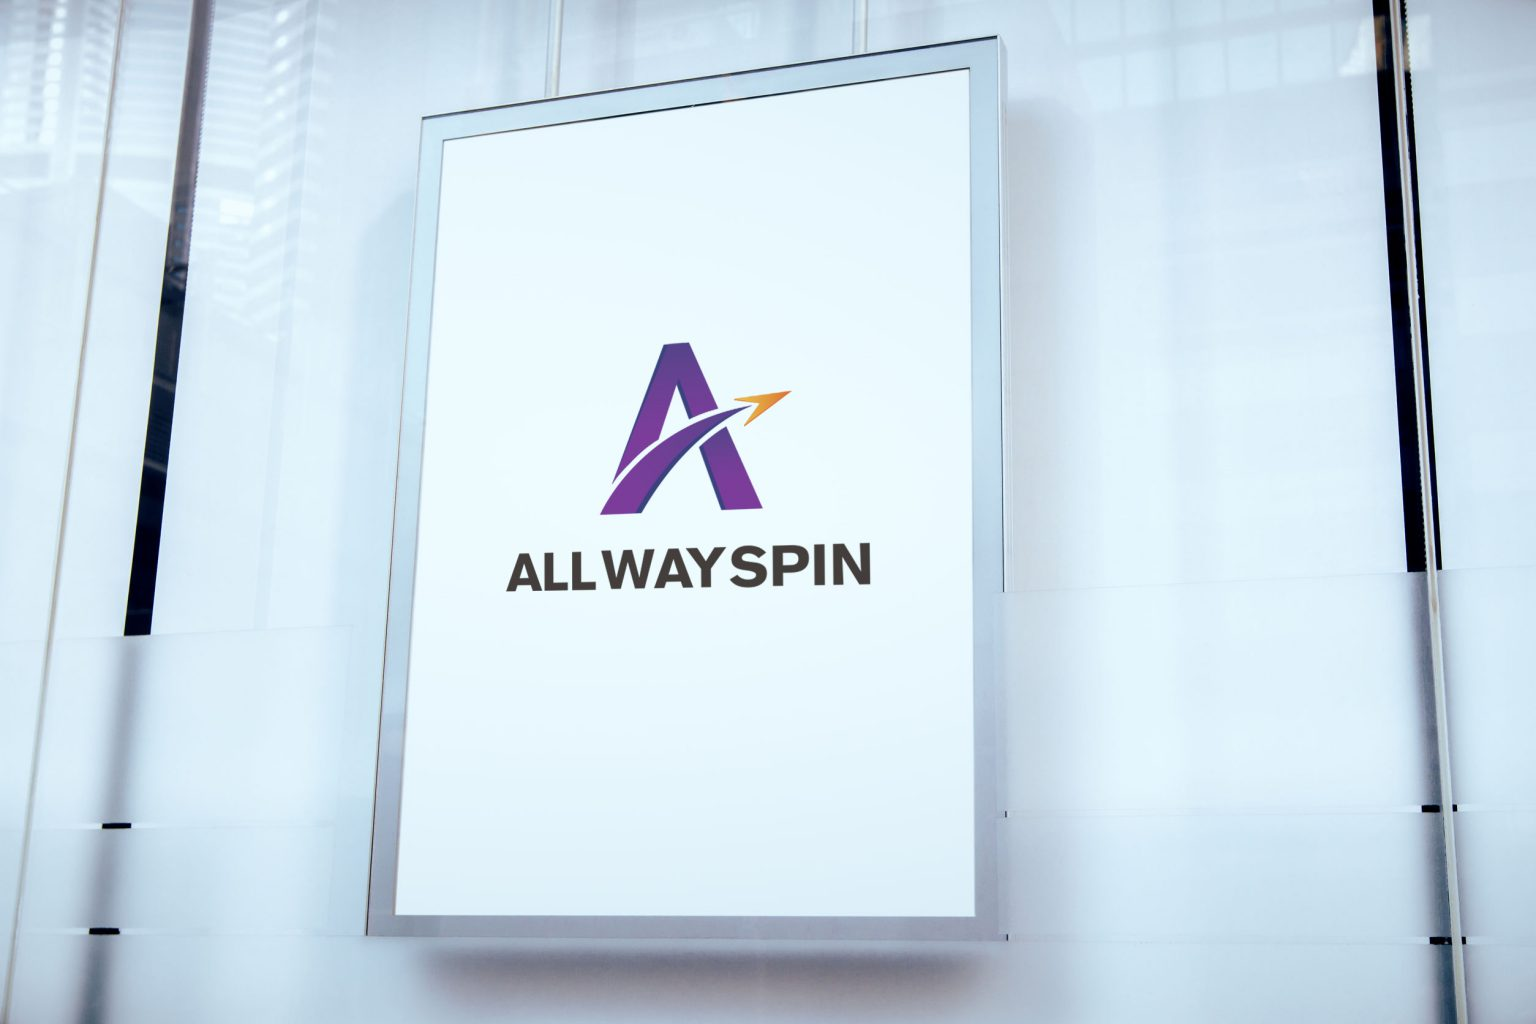 All Way Spin LOGO設計 品牌設計 商標設計 形象設計